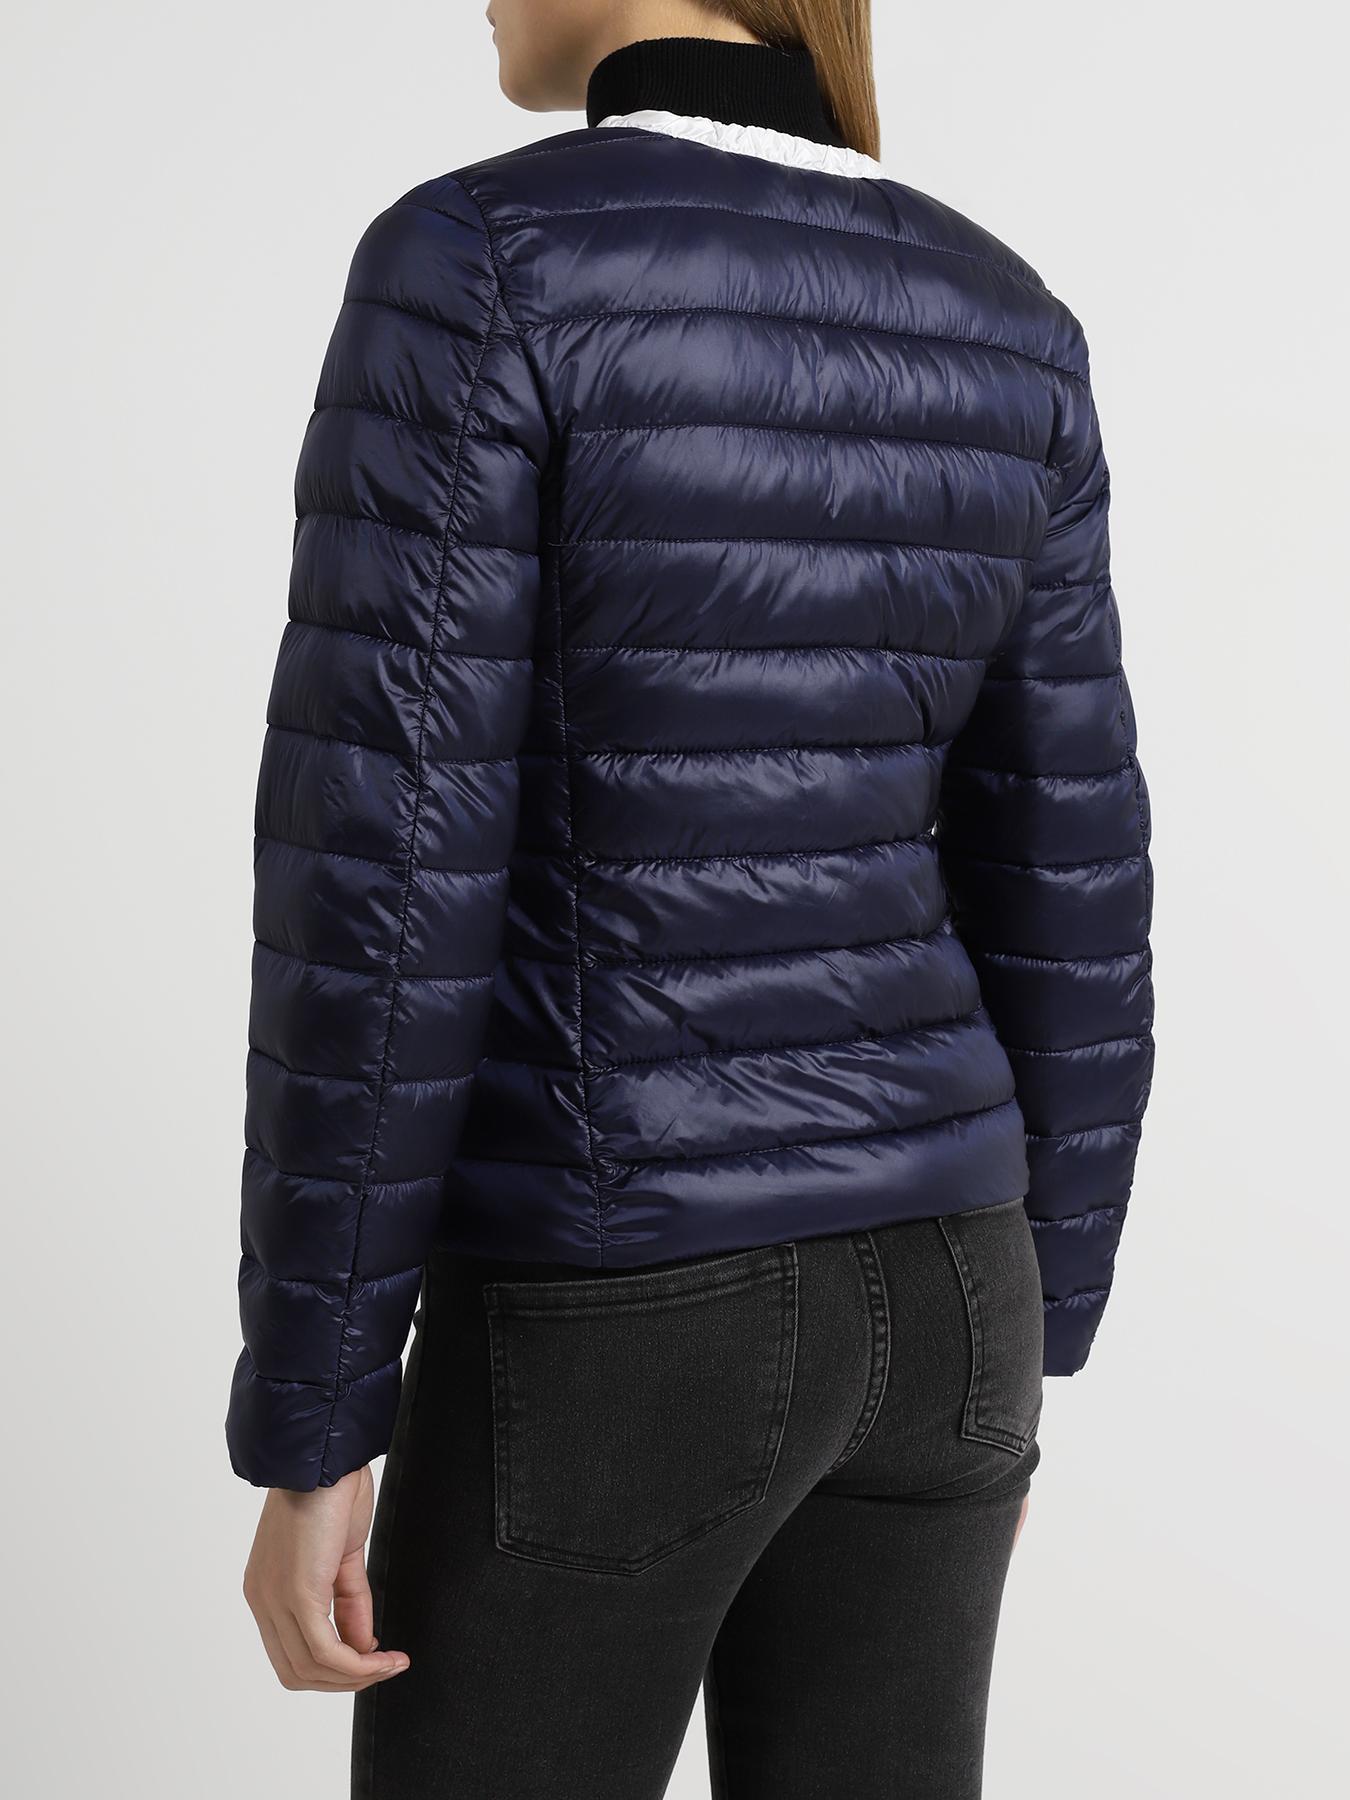 Emme Marella Женская куртка Tisbe 337250-021 Фото 2